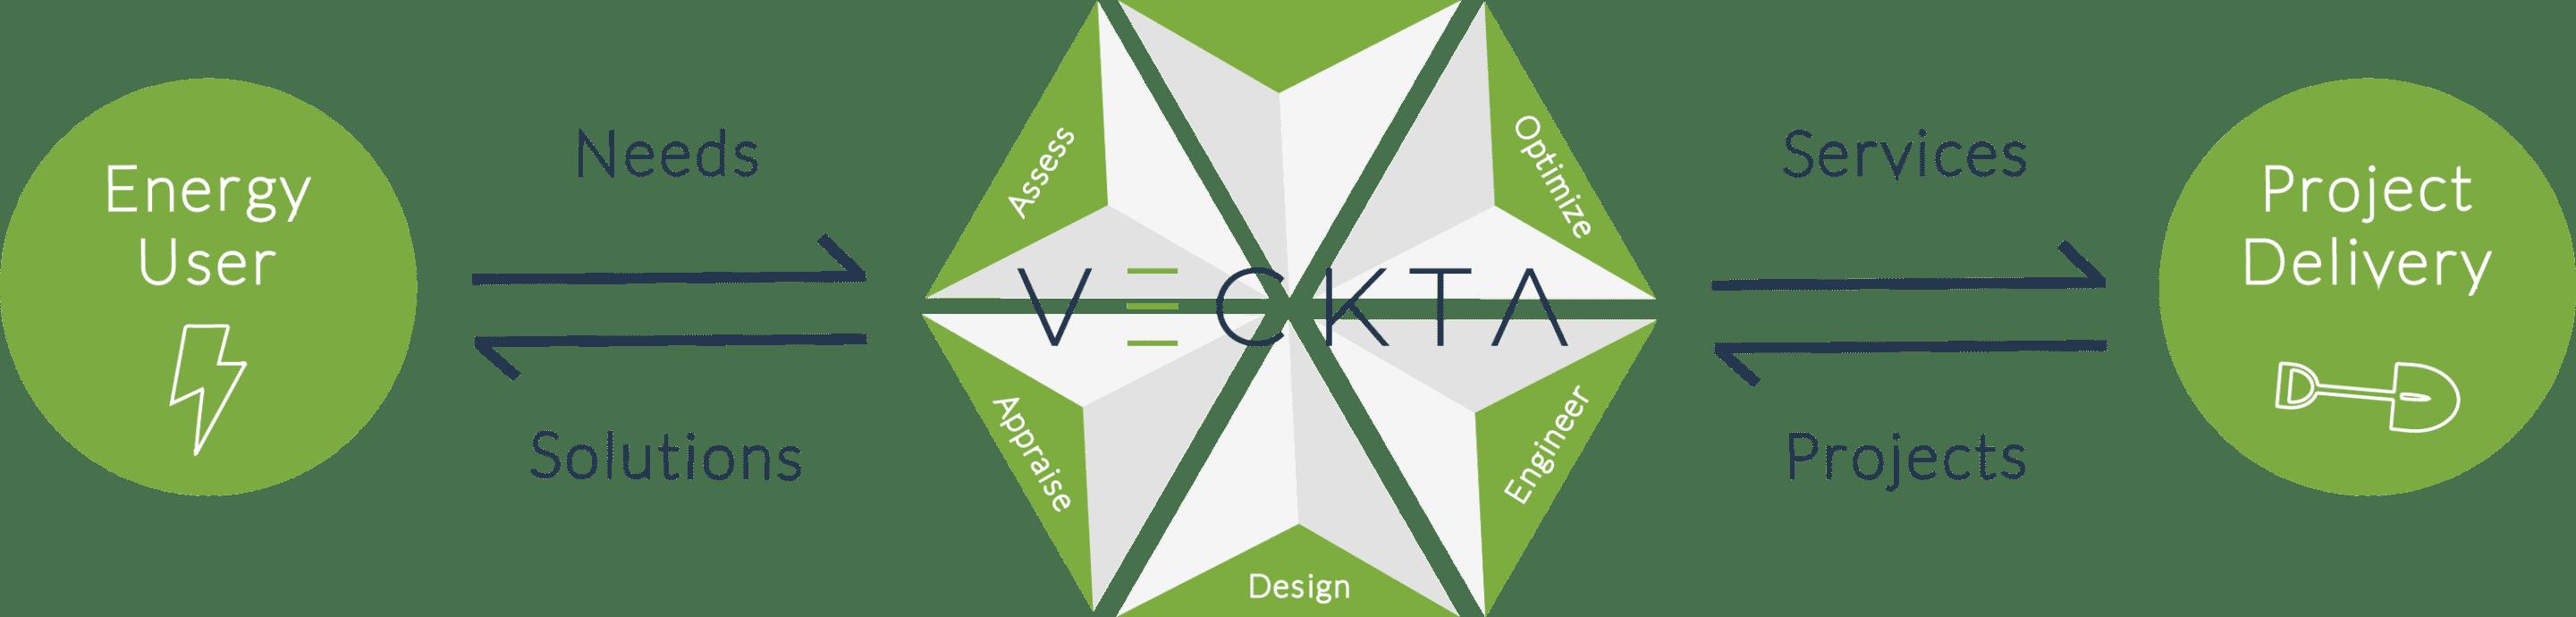 TEMP – VECKTA Infographic